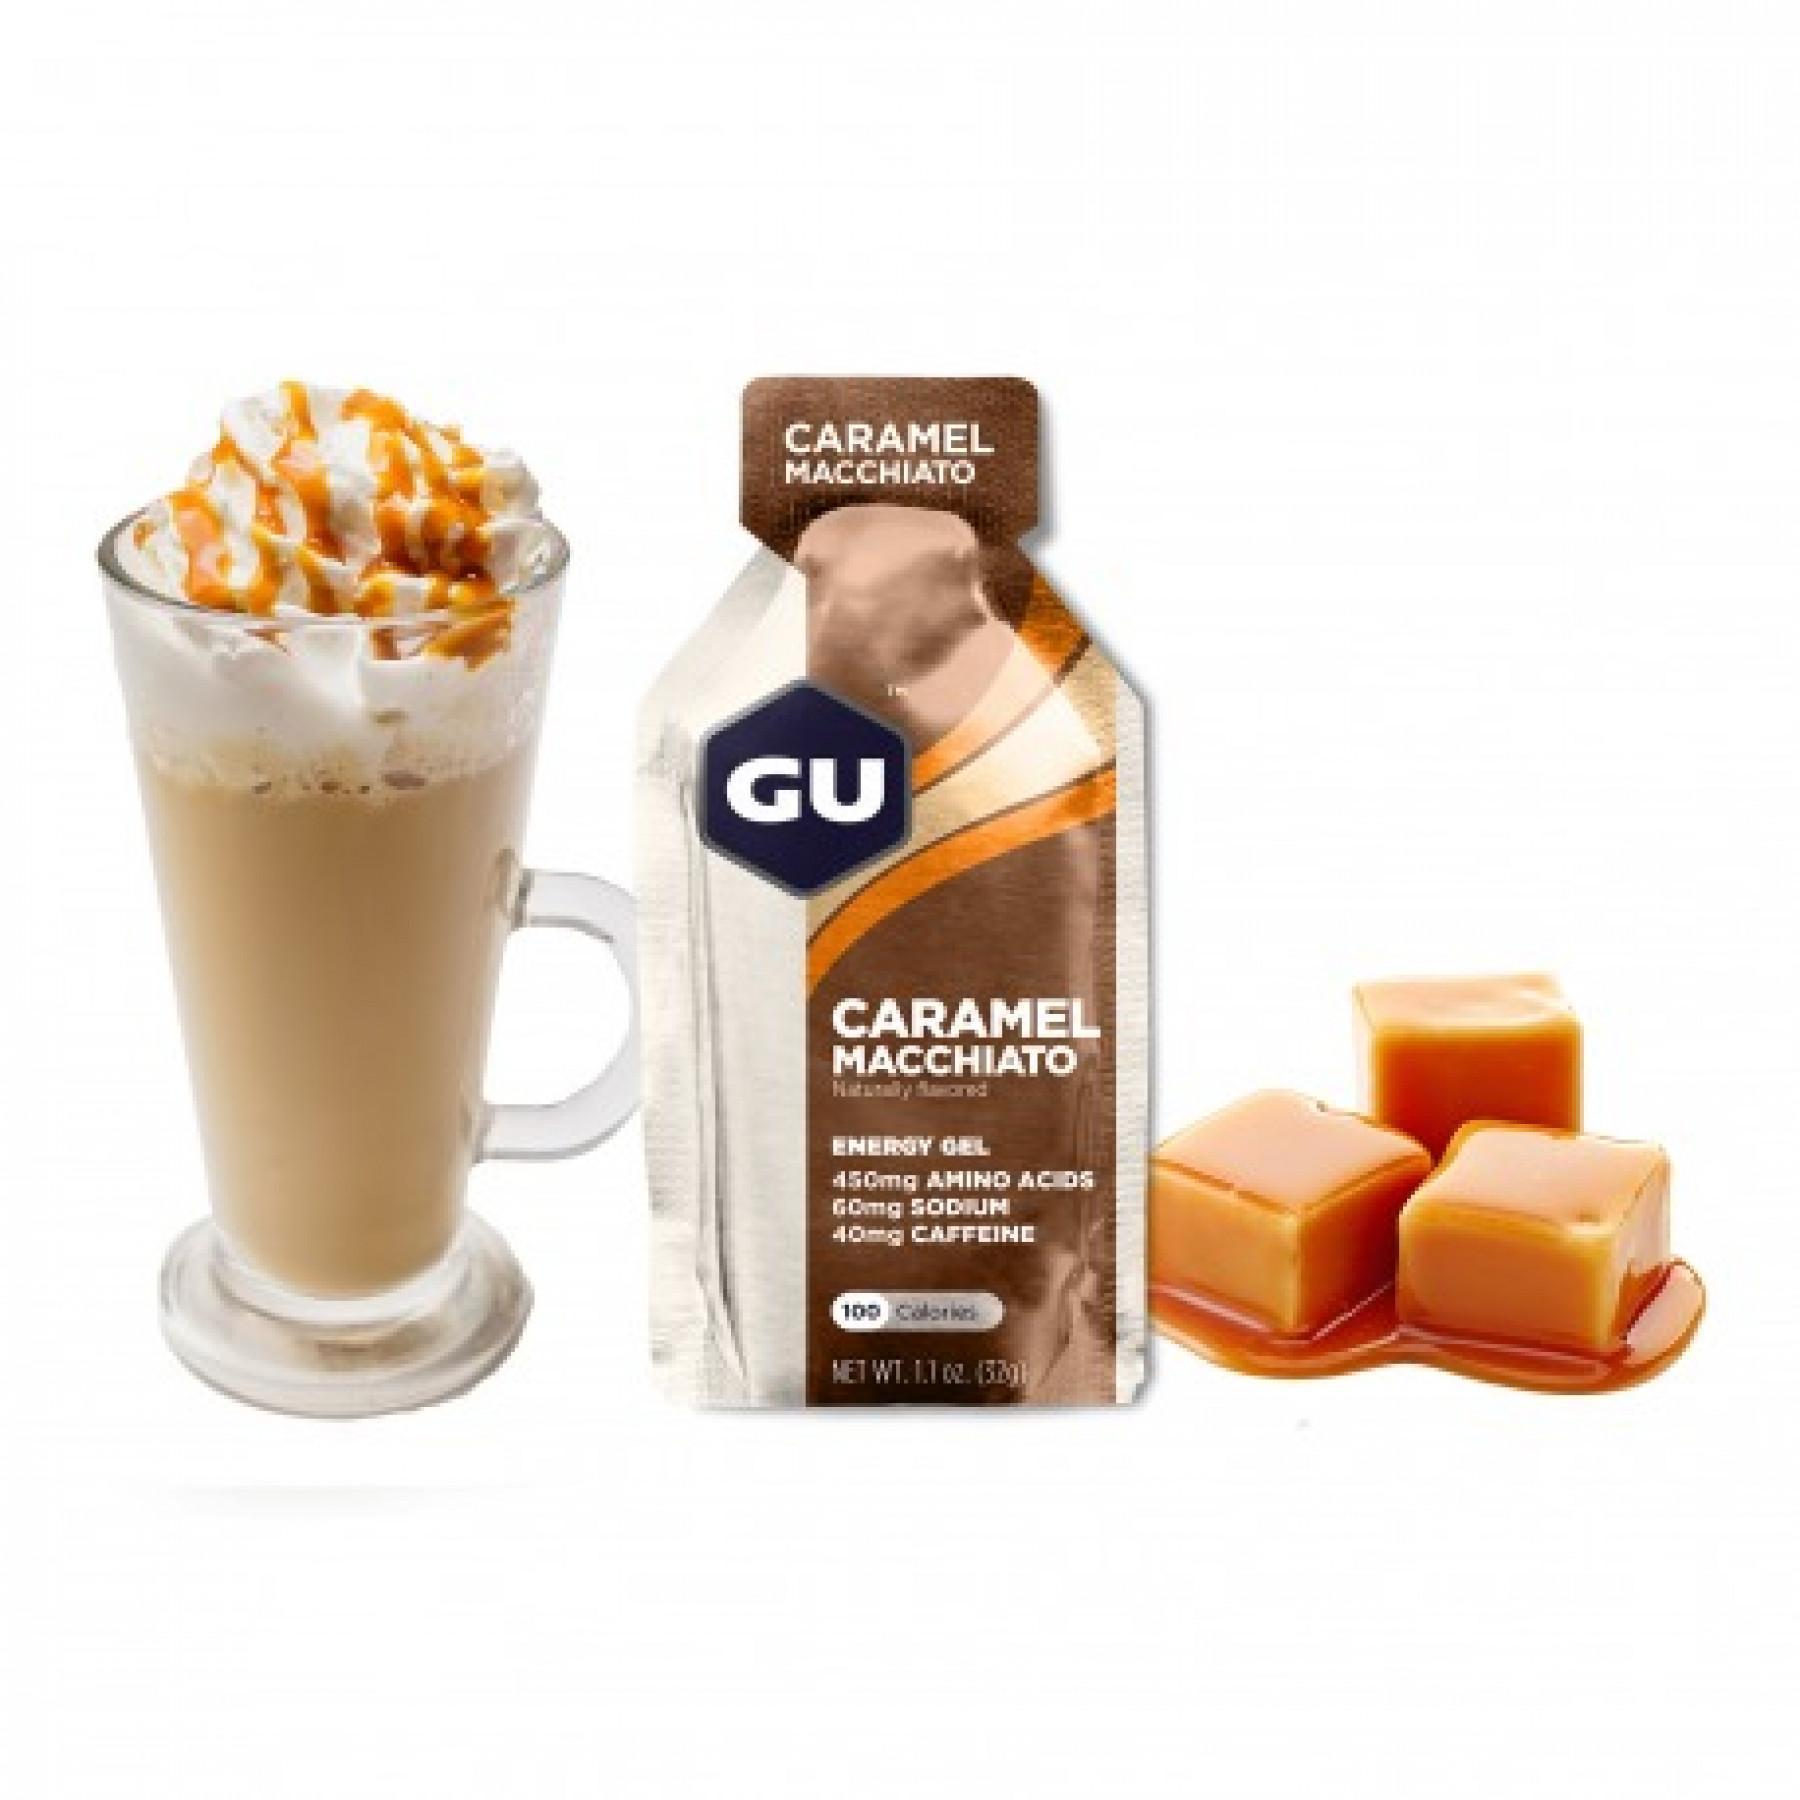 Batch of 24 gels Gu Energy caramel macchiato caféiné